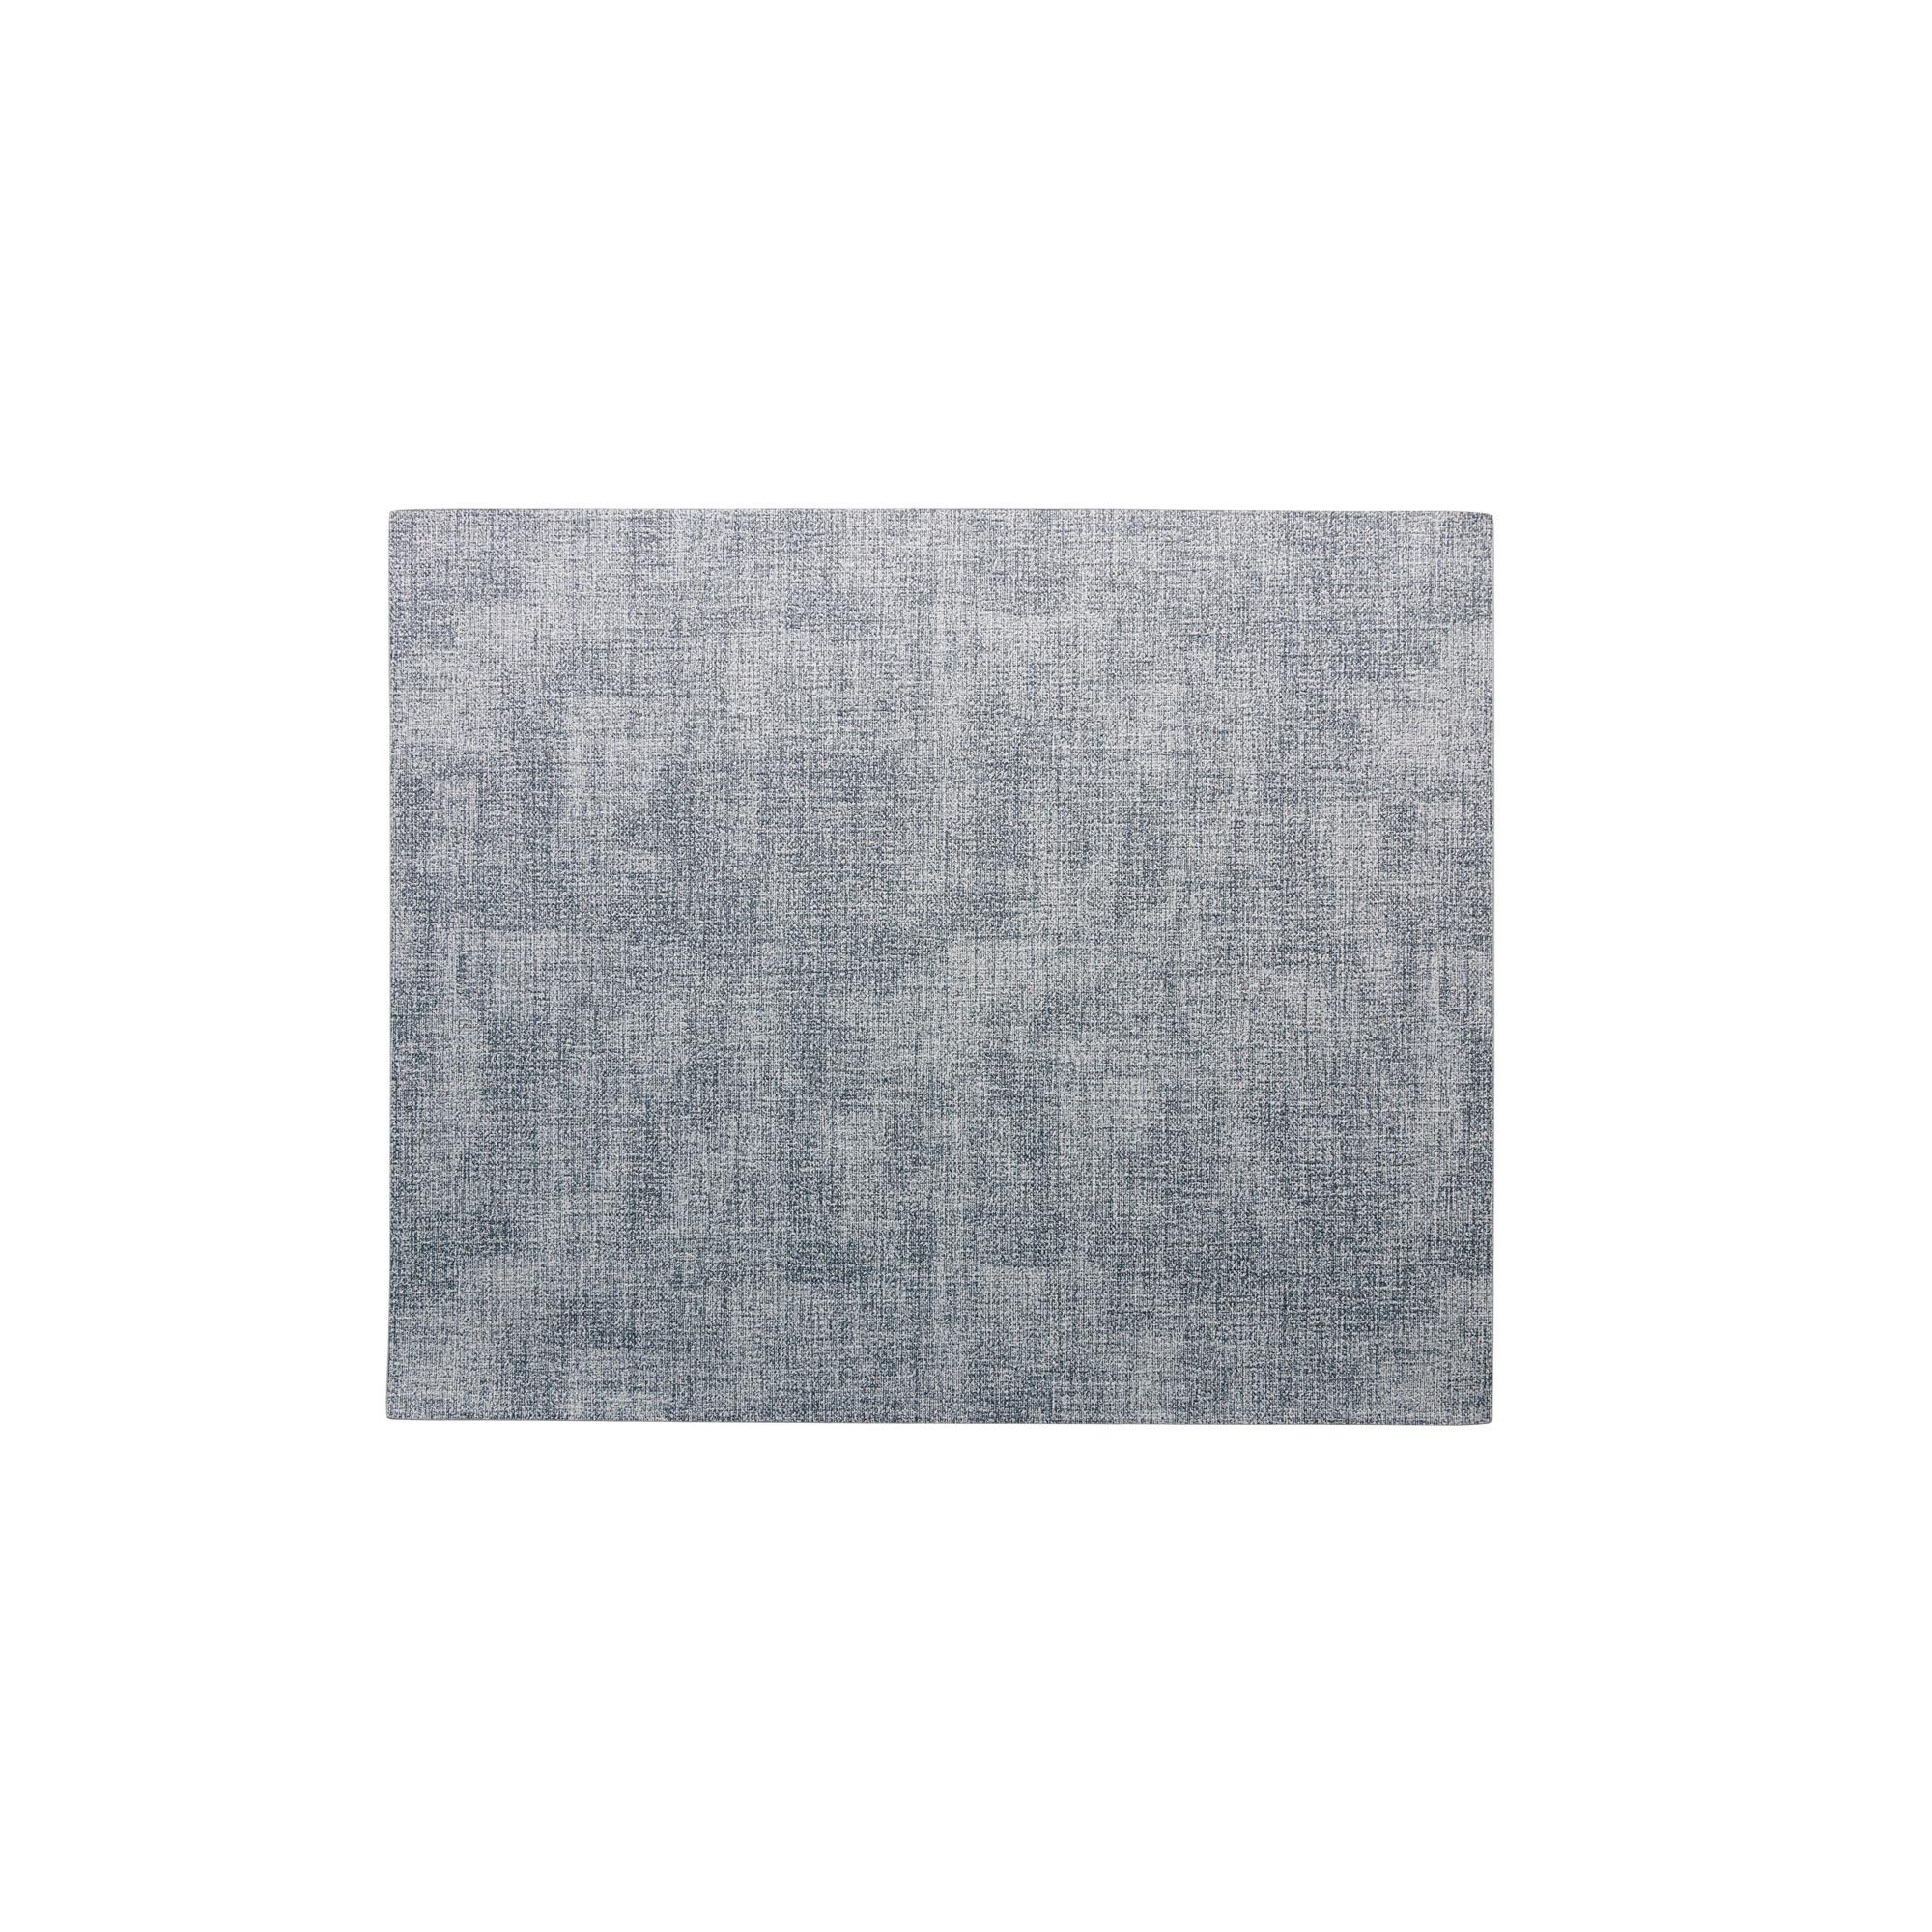 LUGAR AMERICANO PVC AZUL 44x35cm